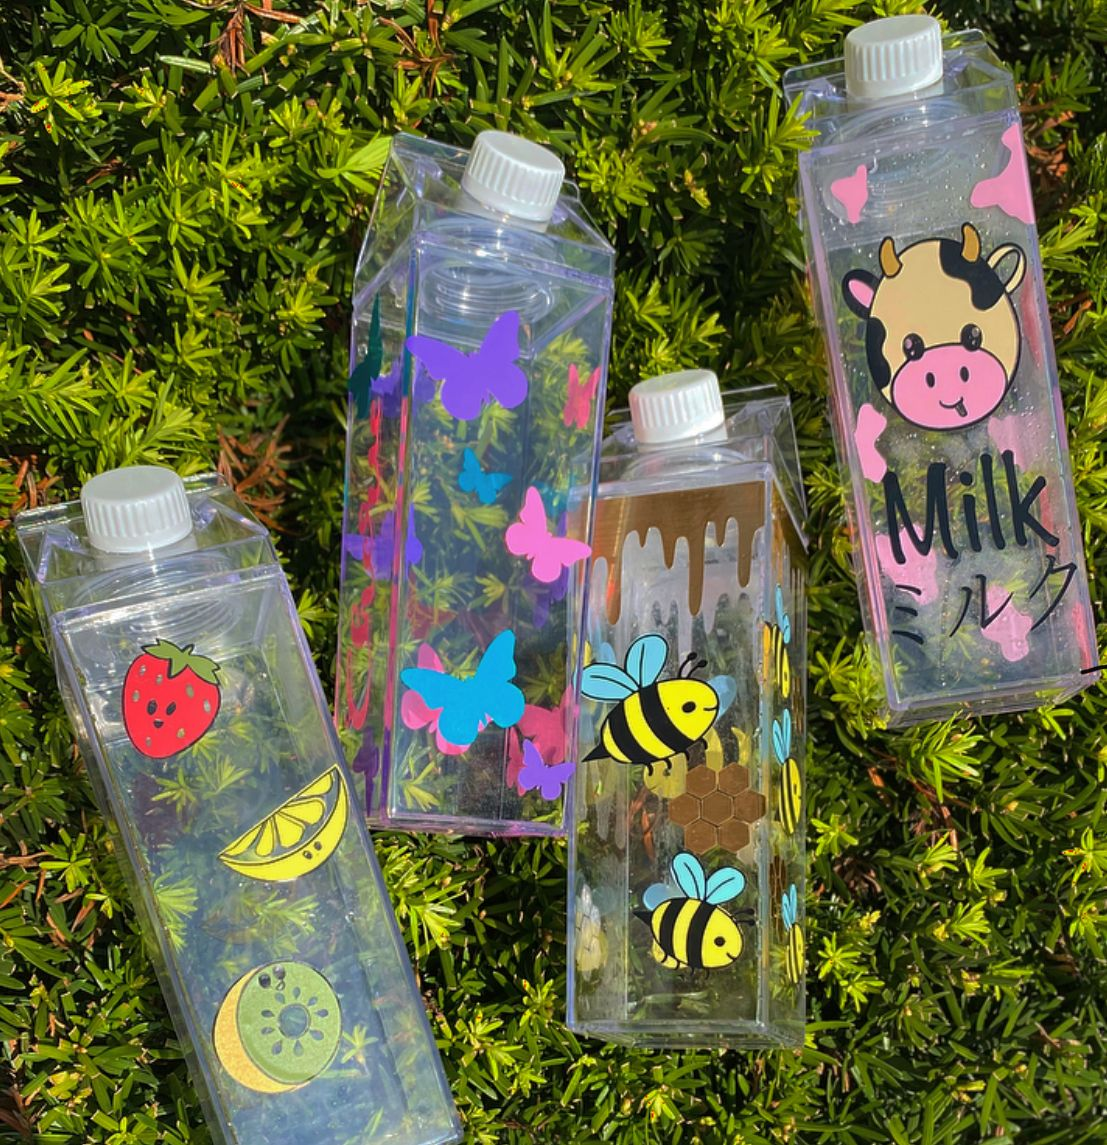 Water Bottle Carton Milk Water Bottle Tiktik Milk Carton Water Bottle,New Milk Water Bottle